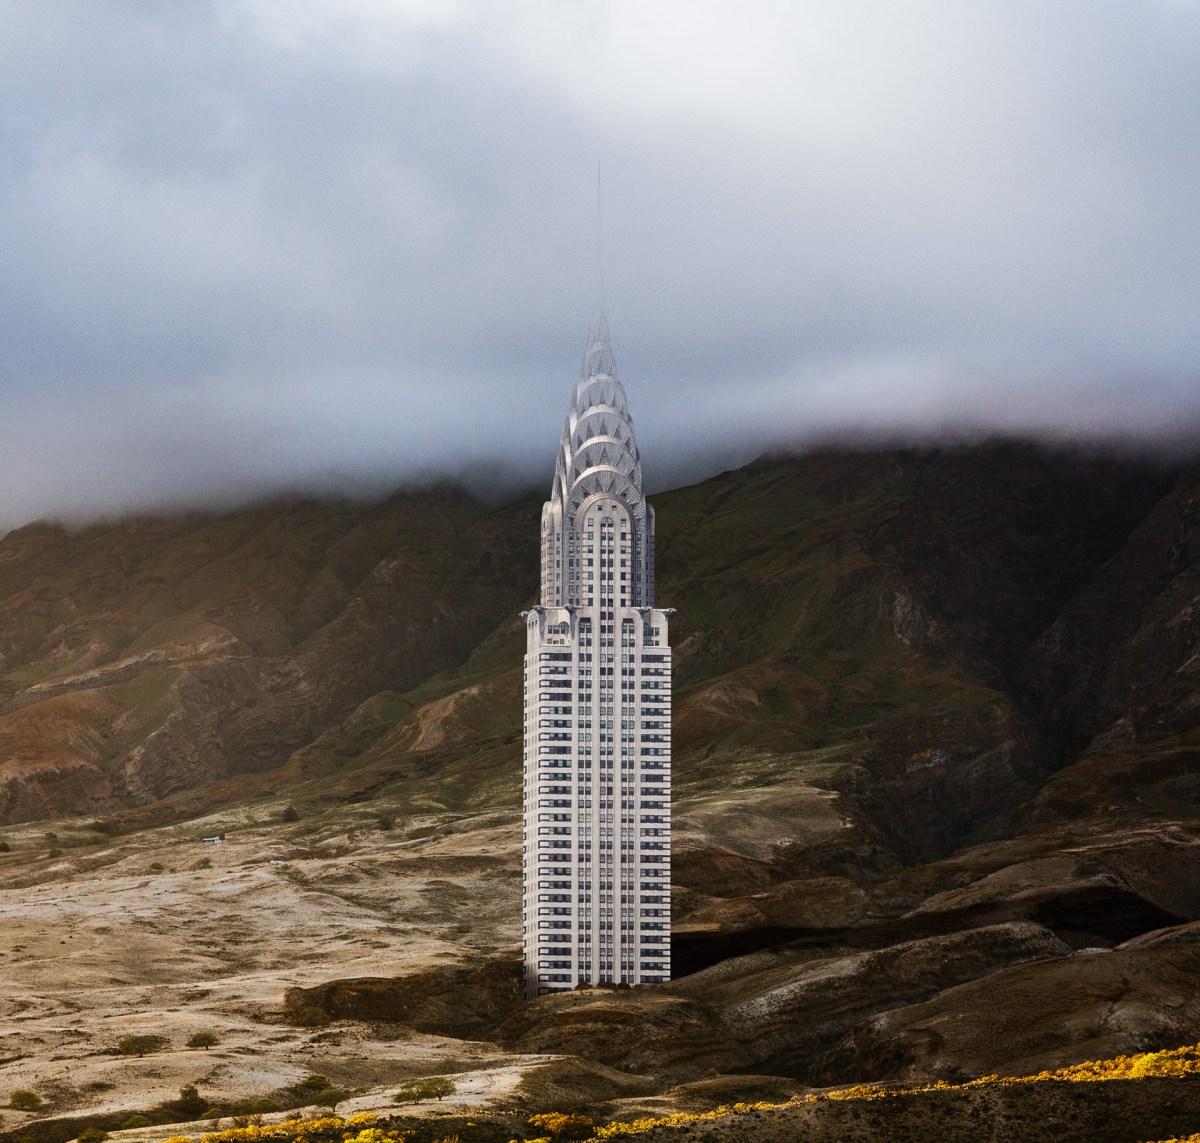 Misplaced New York Landmarks